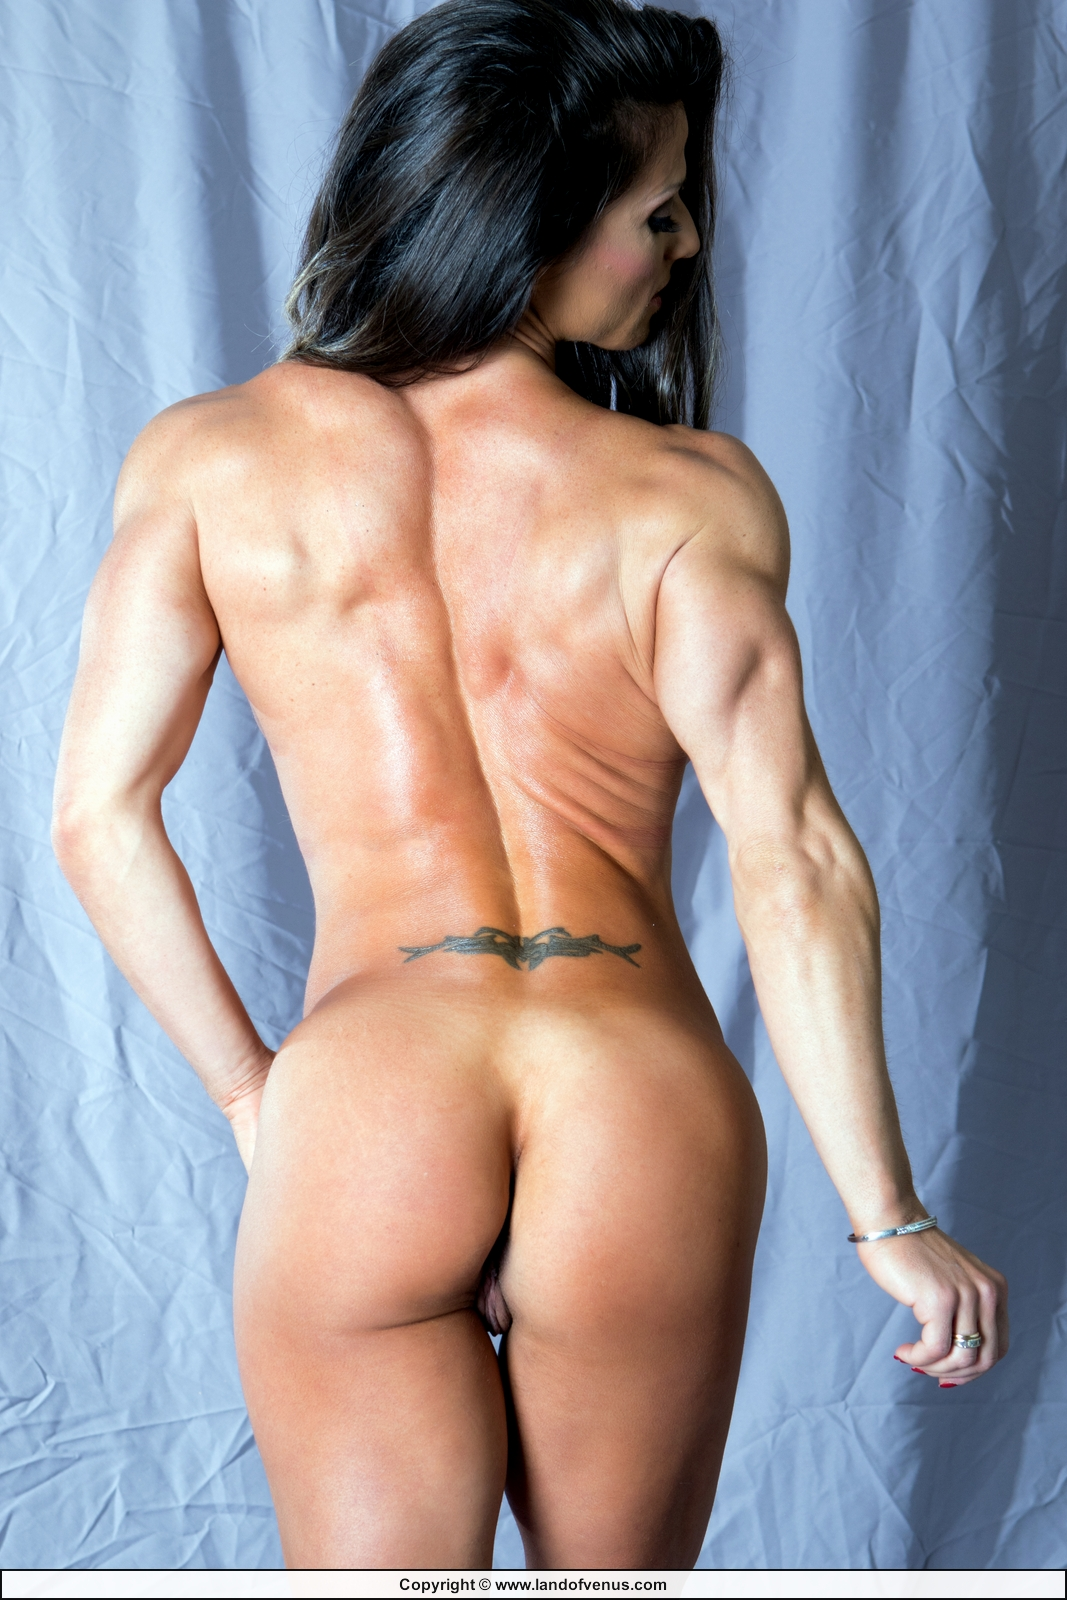 Sheila rock muscle free porn galery